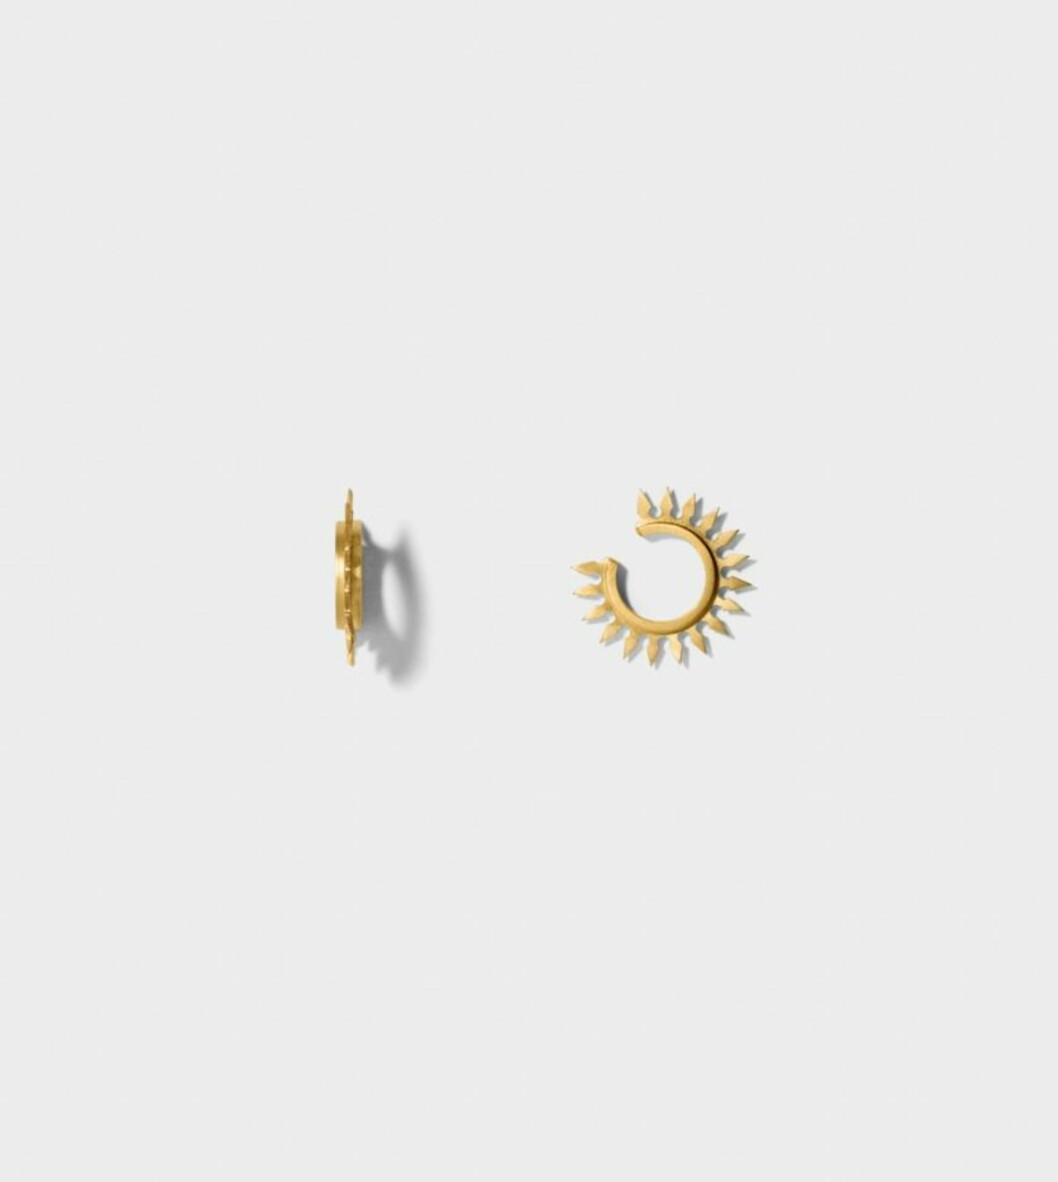 <strong>Ear cuff fra Line&Jo | kr 3450 | http:</strong>//www.lineandjo.com/product/1962-linejo-miss-eireen-gold